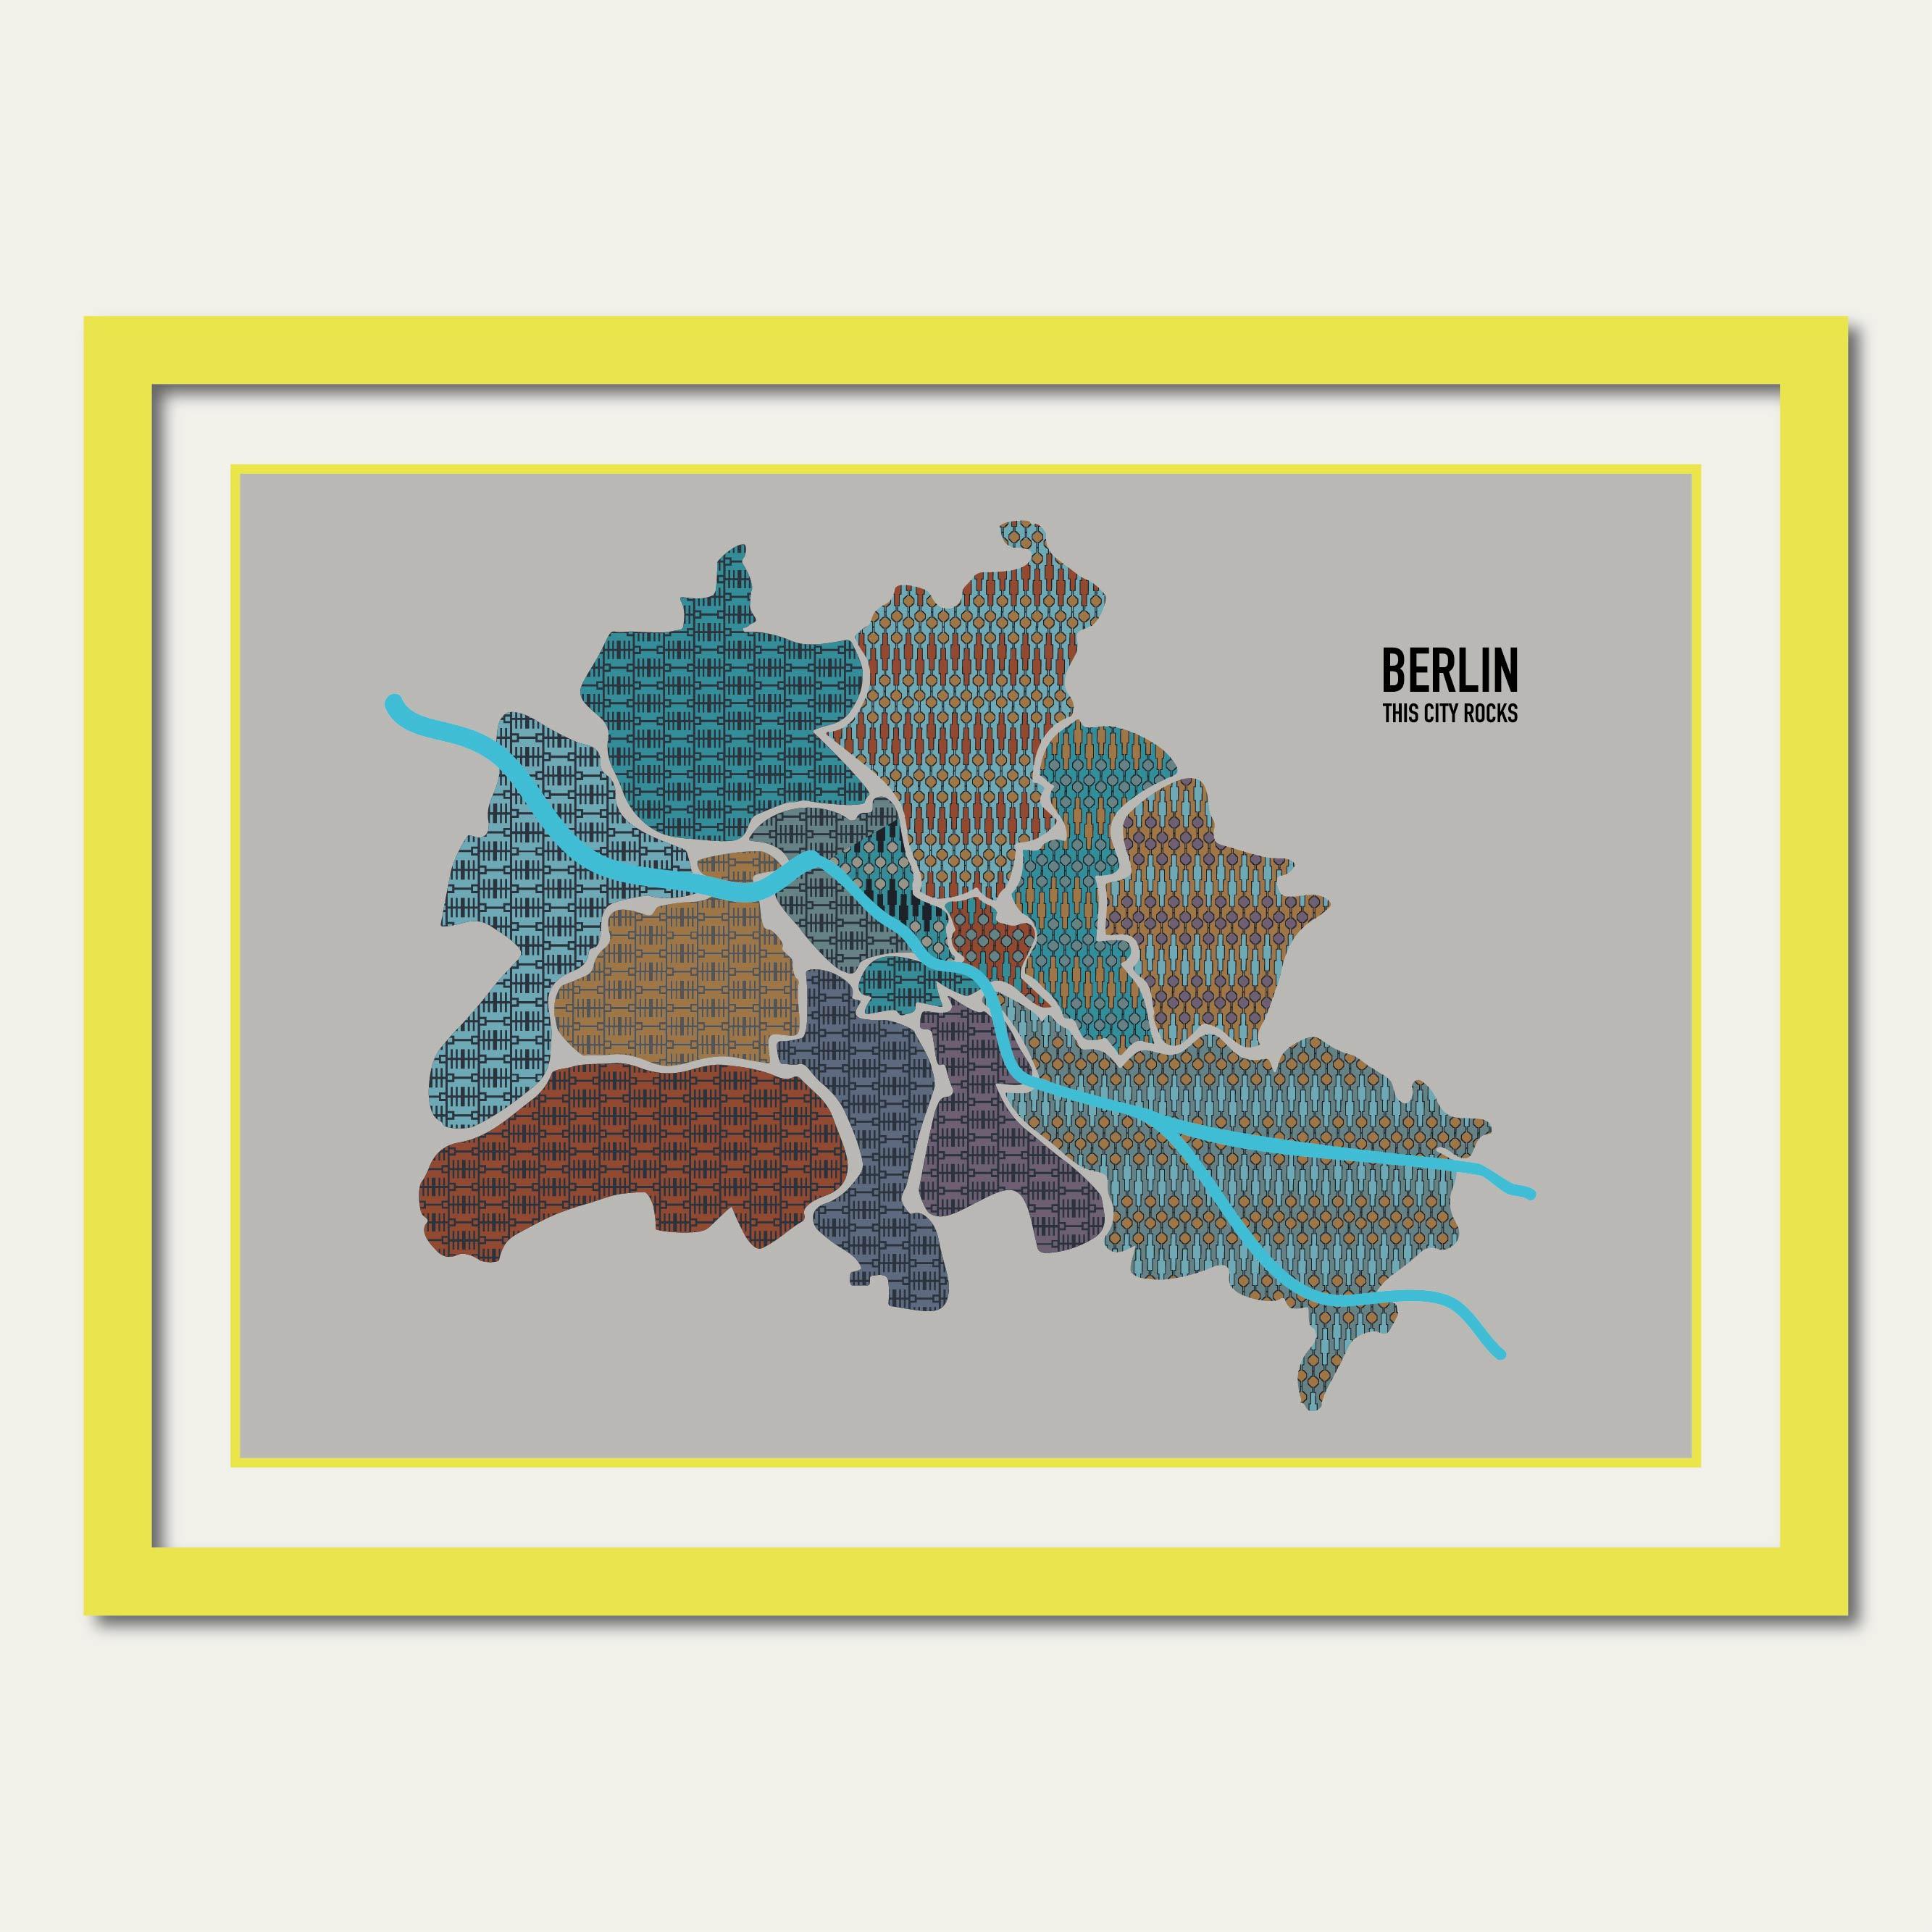 Berlin Poster Map